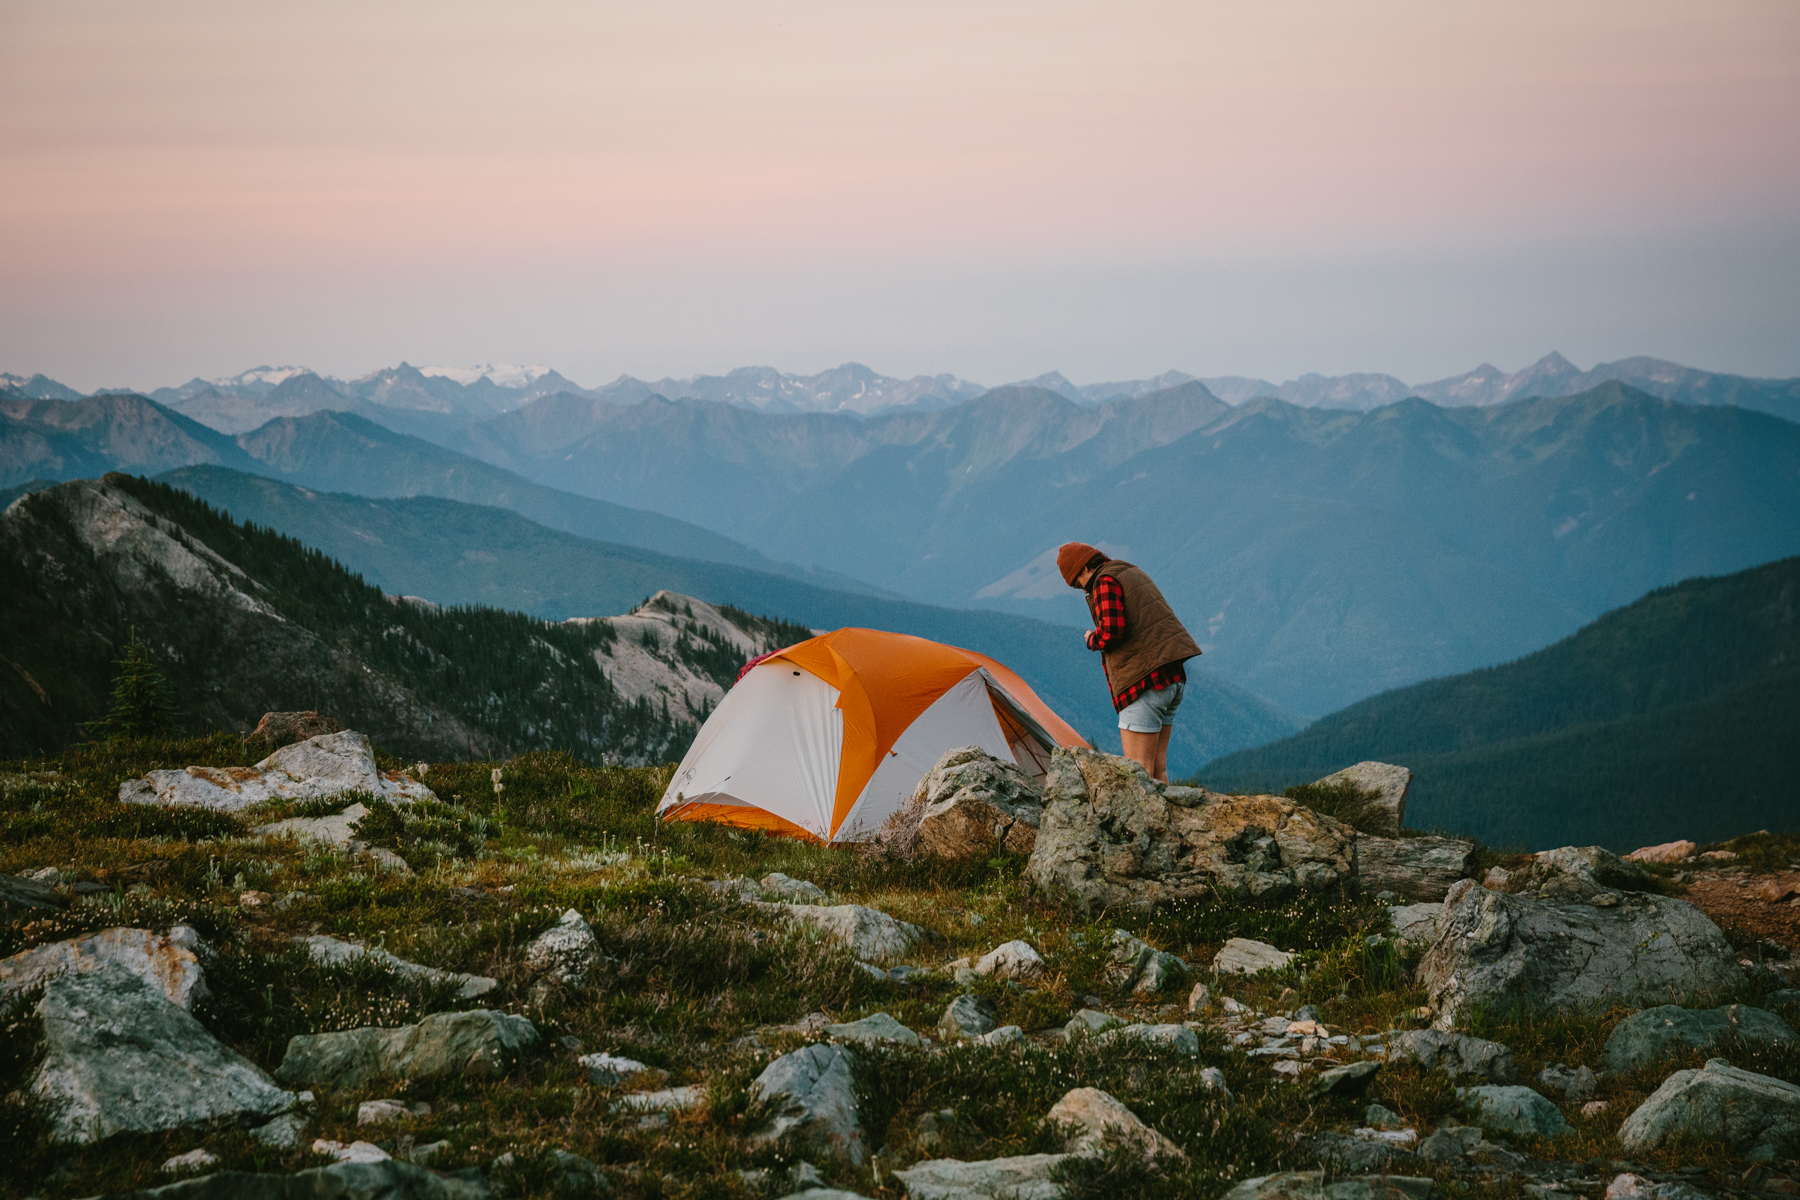 britishcolumbia-canada-lifestyle-photography-mikeseehagel-22